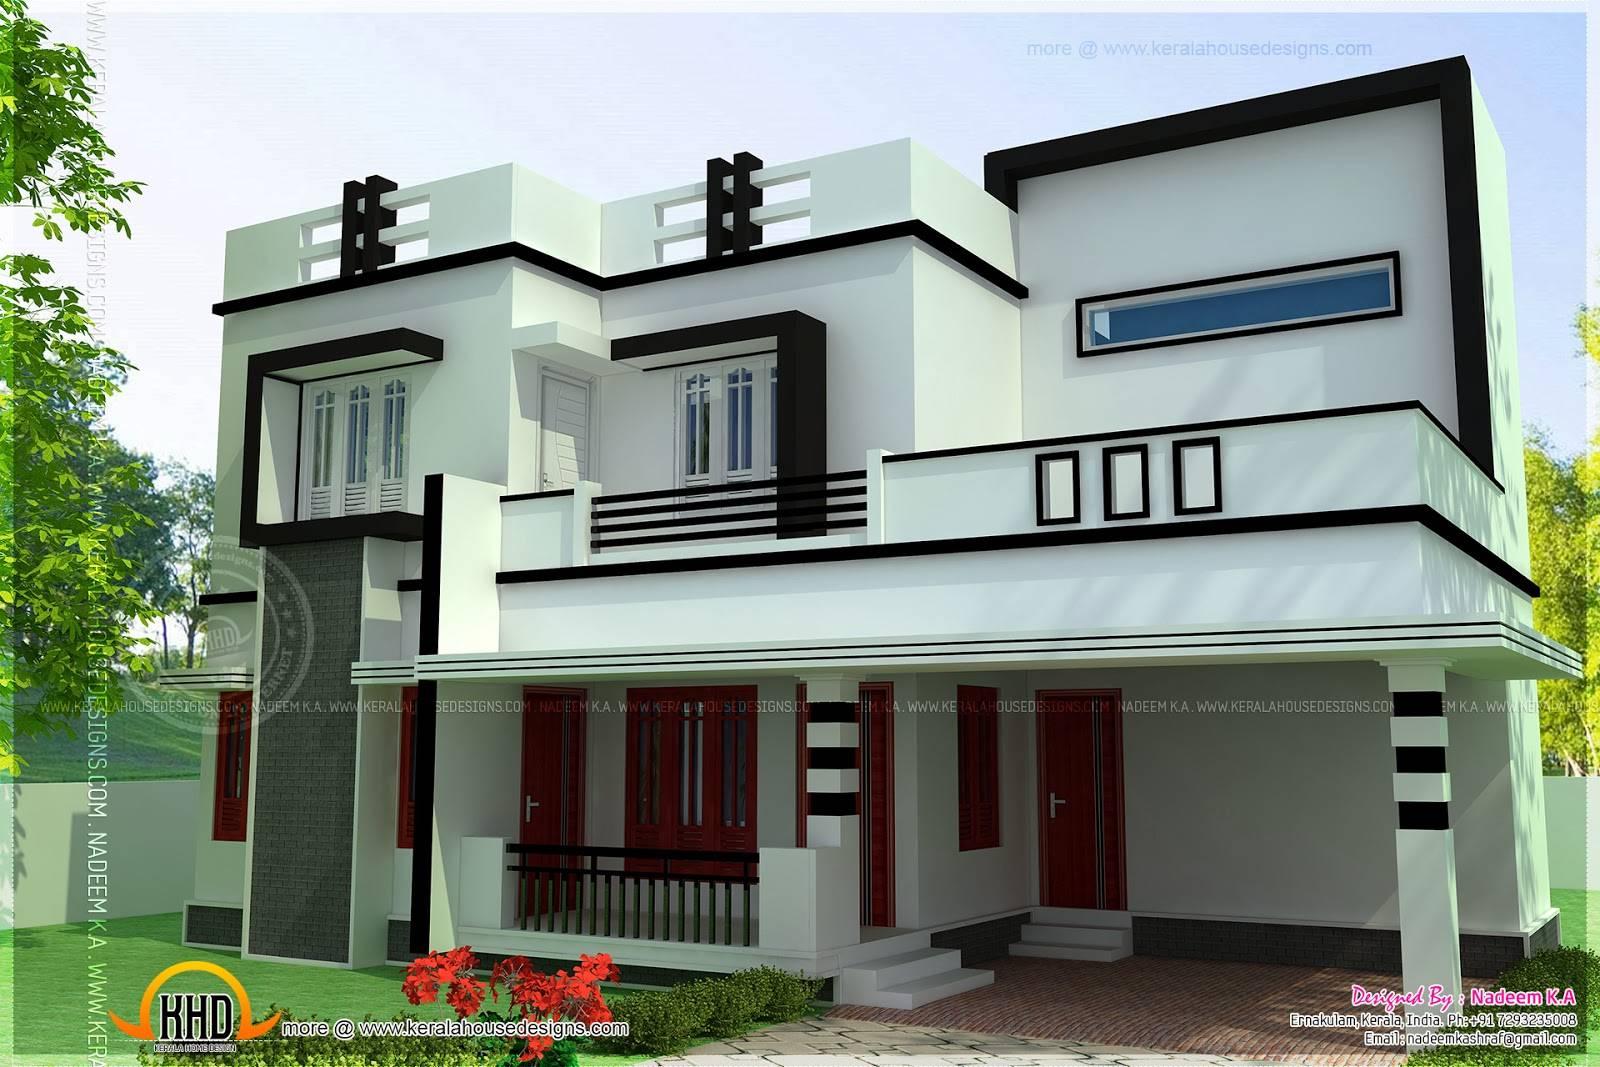 Flat Roof Bedroom Modern House Kerala Home Design Floor Plans House Plans 66941